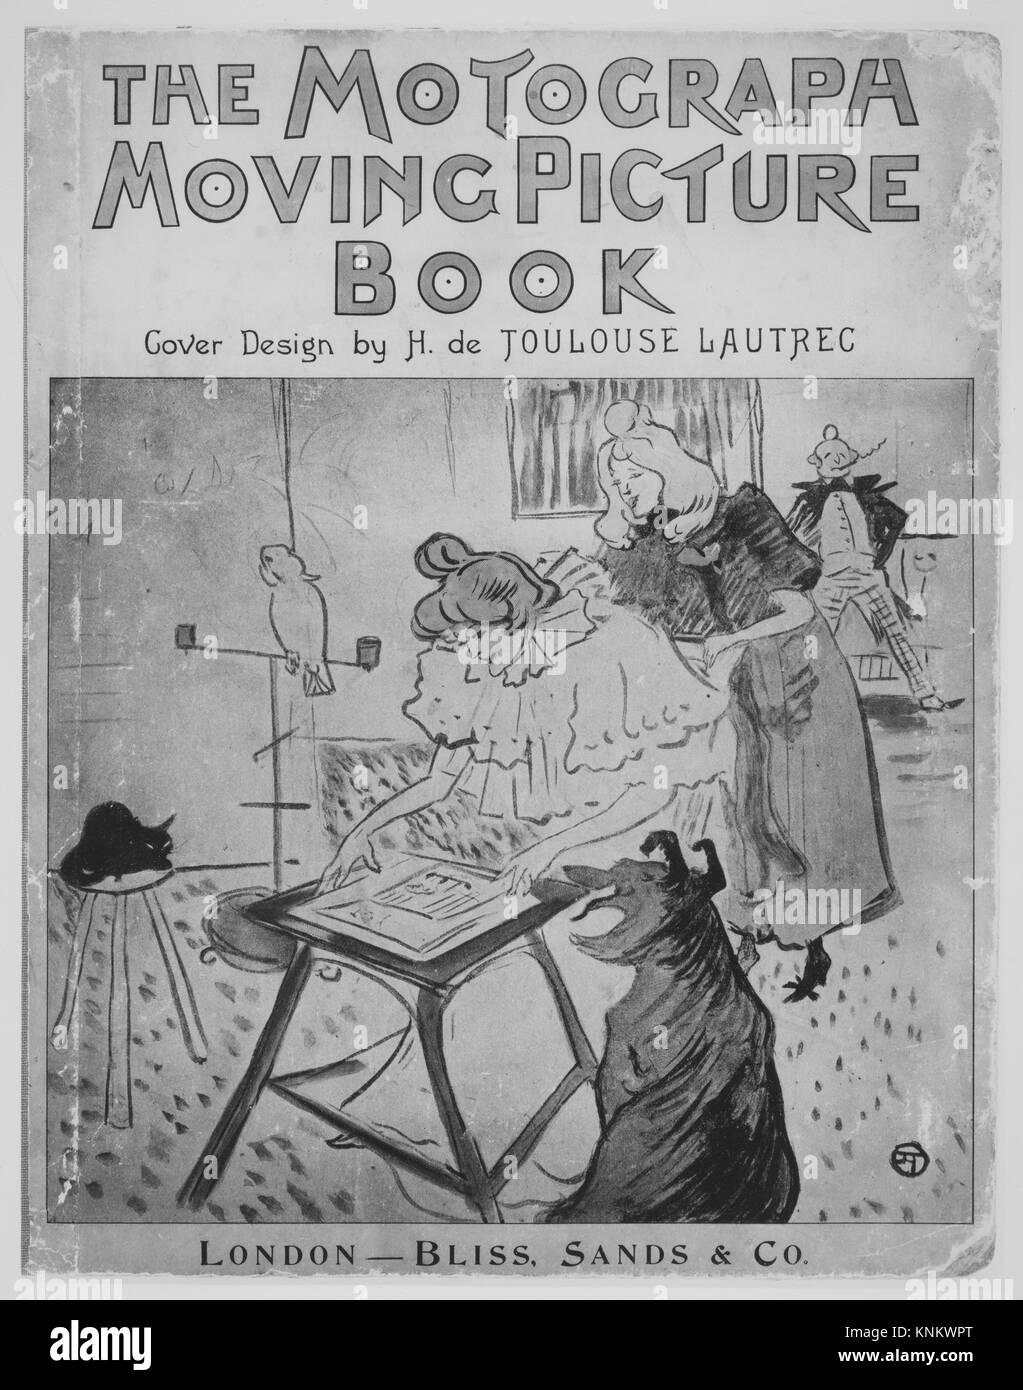 The Motograph Moving Picture Book. Designer: Cover by Henri de Toulouse-Lautrec (French, Albi 1864-1901 Saint-André - Stock Image